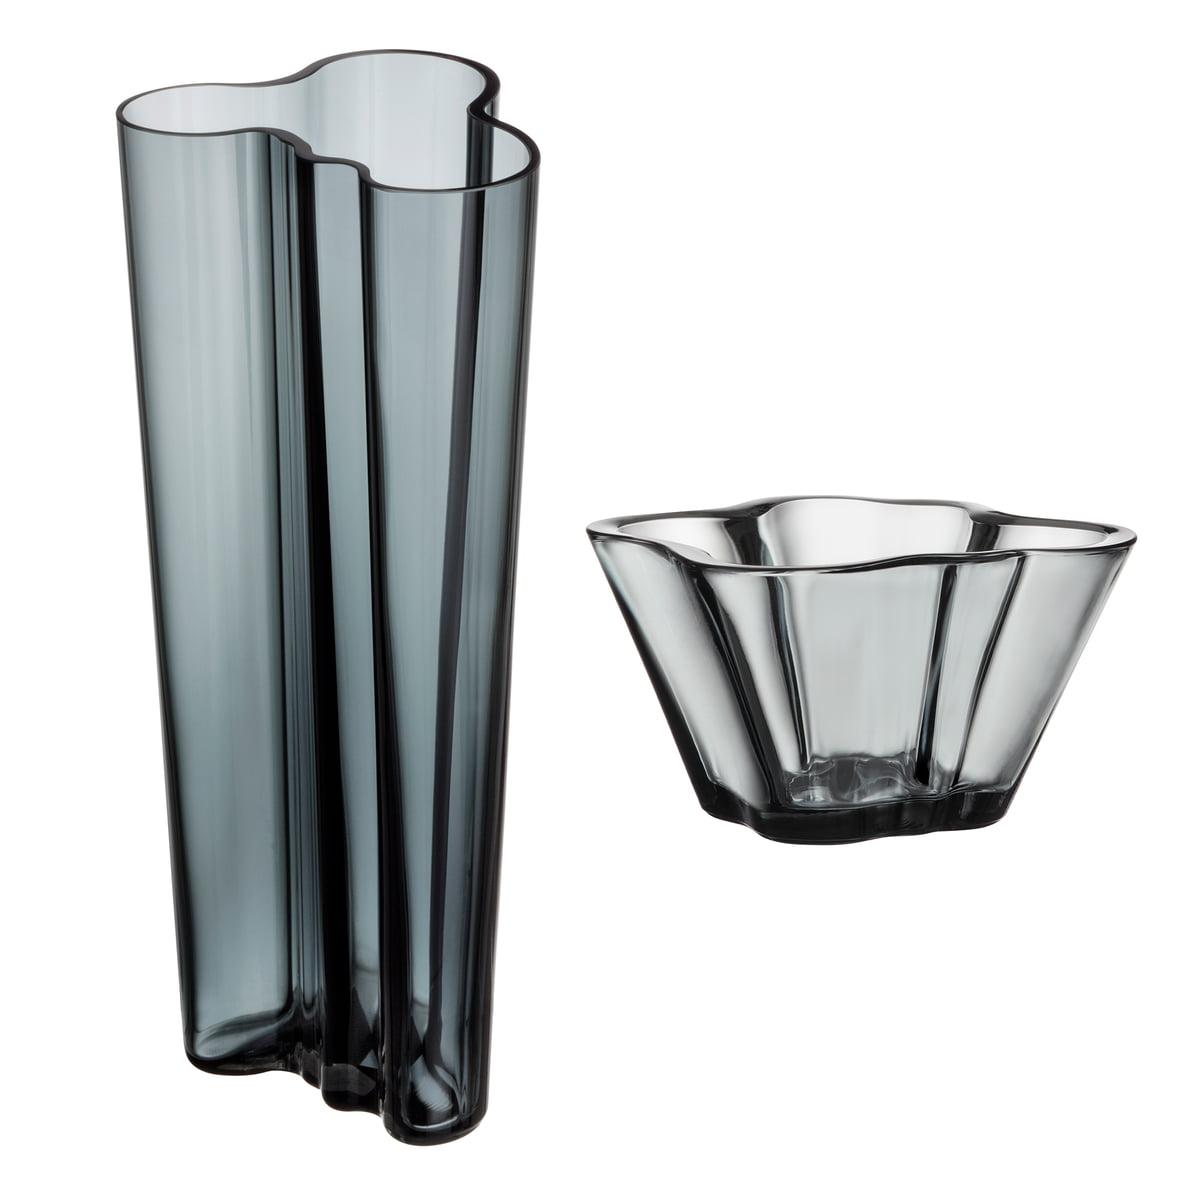 offer set aalto vase finlandia 255 mm aalto bowl 75 mm by iittala in - Aalto Vase